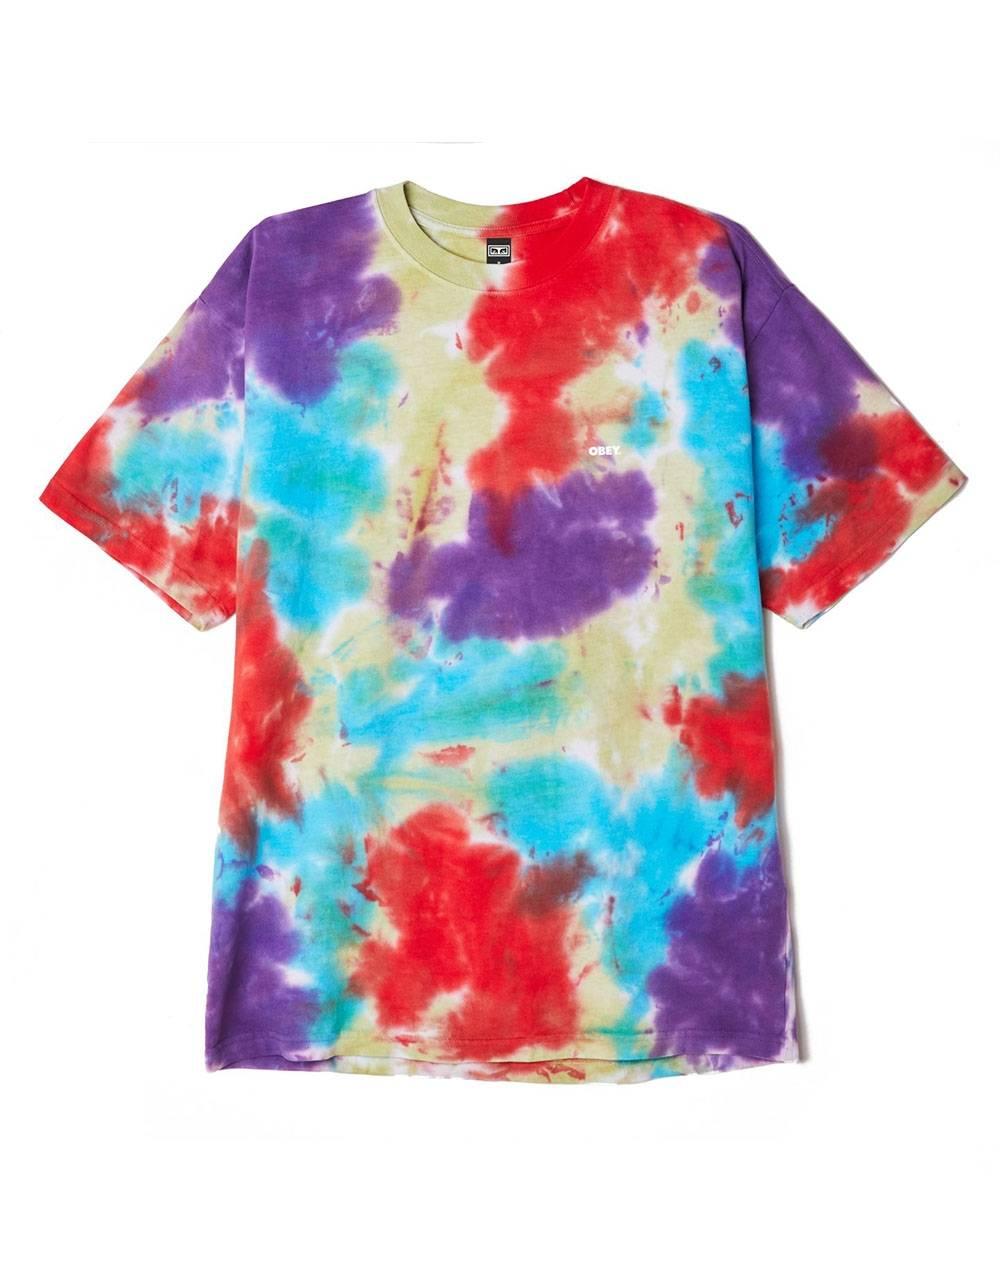 Obey Bold heavyweight blotch tie dye t-shirt - oxy fire blotch obey T-shirt 48,36€